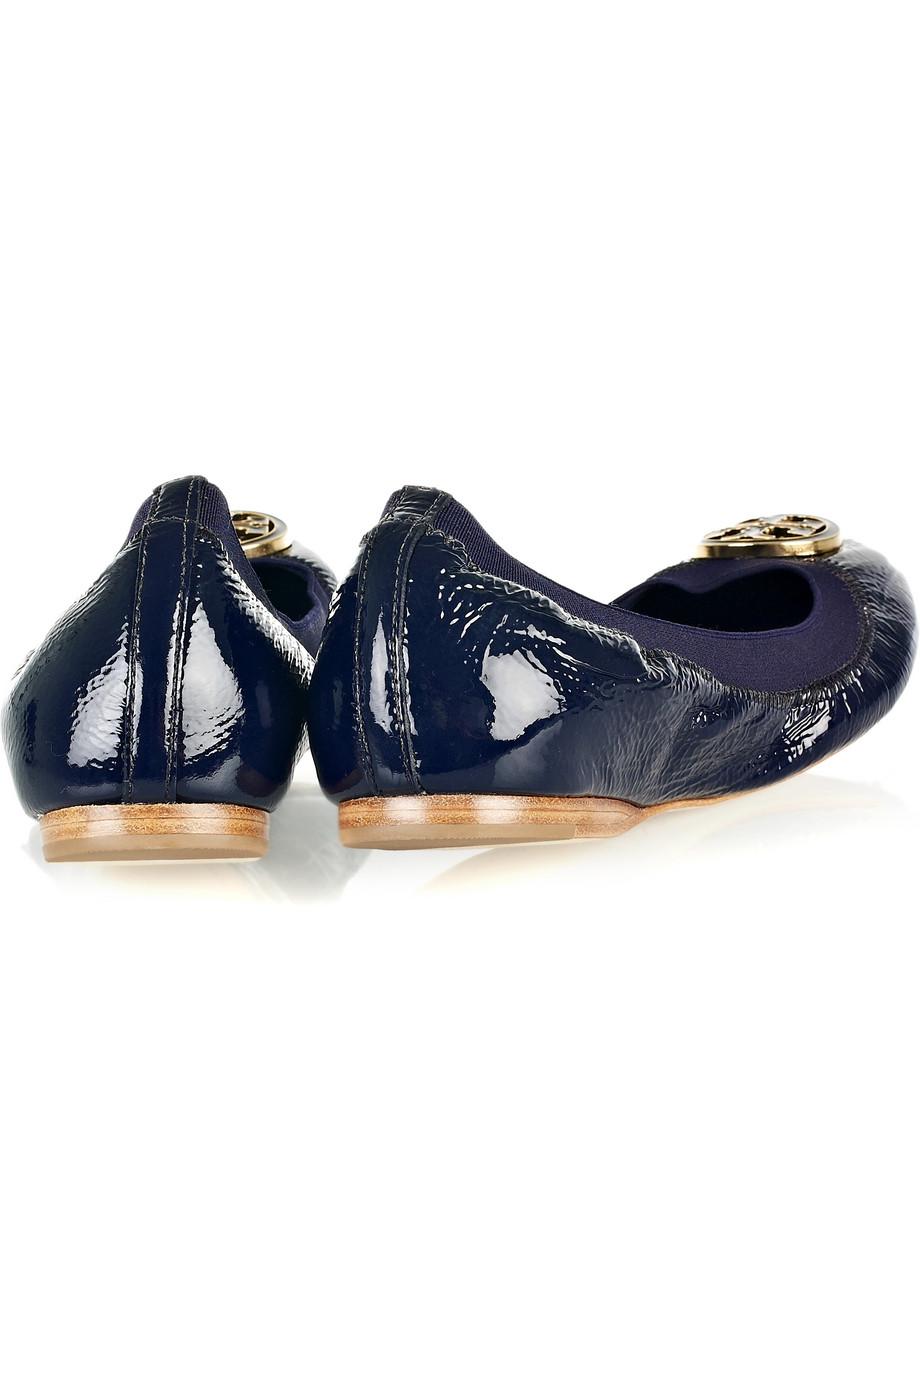 Tory Burch Caroline Patent Leather Ballerina Flats In Blue